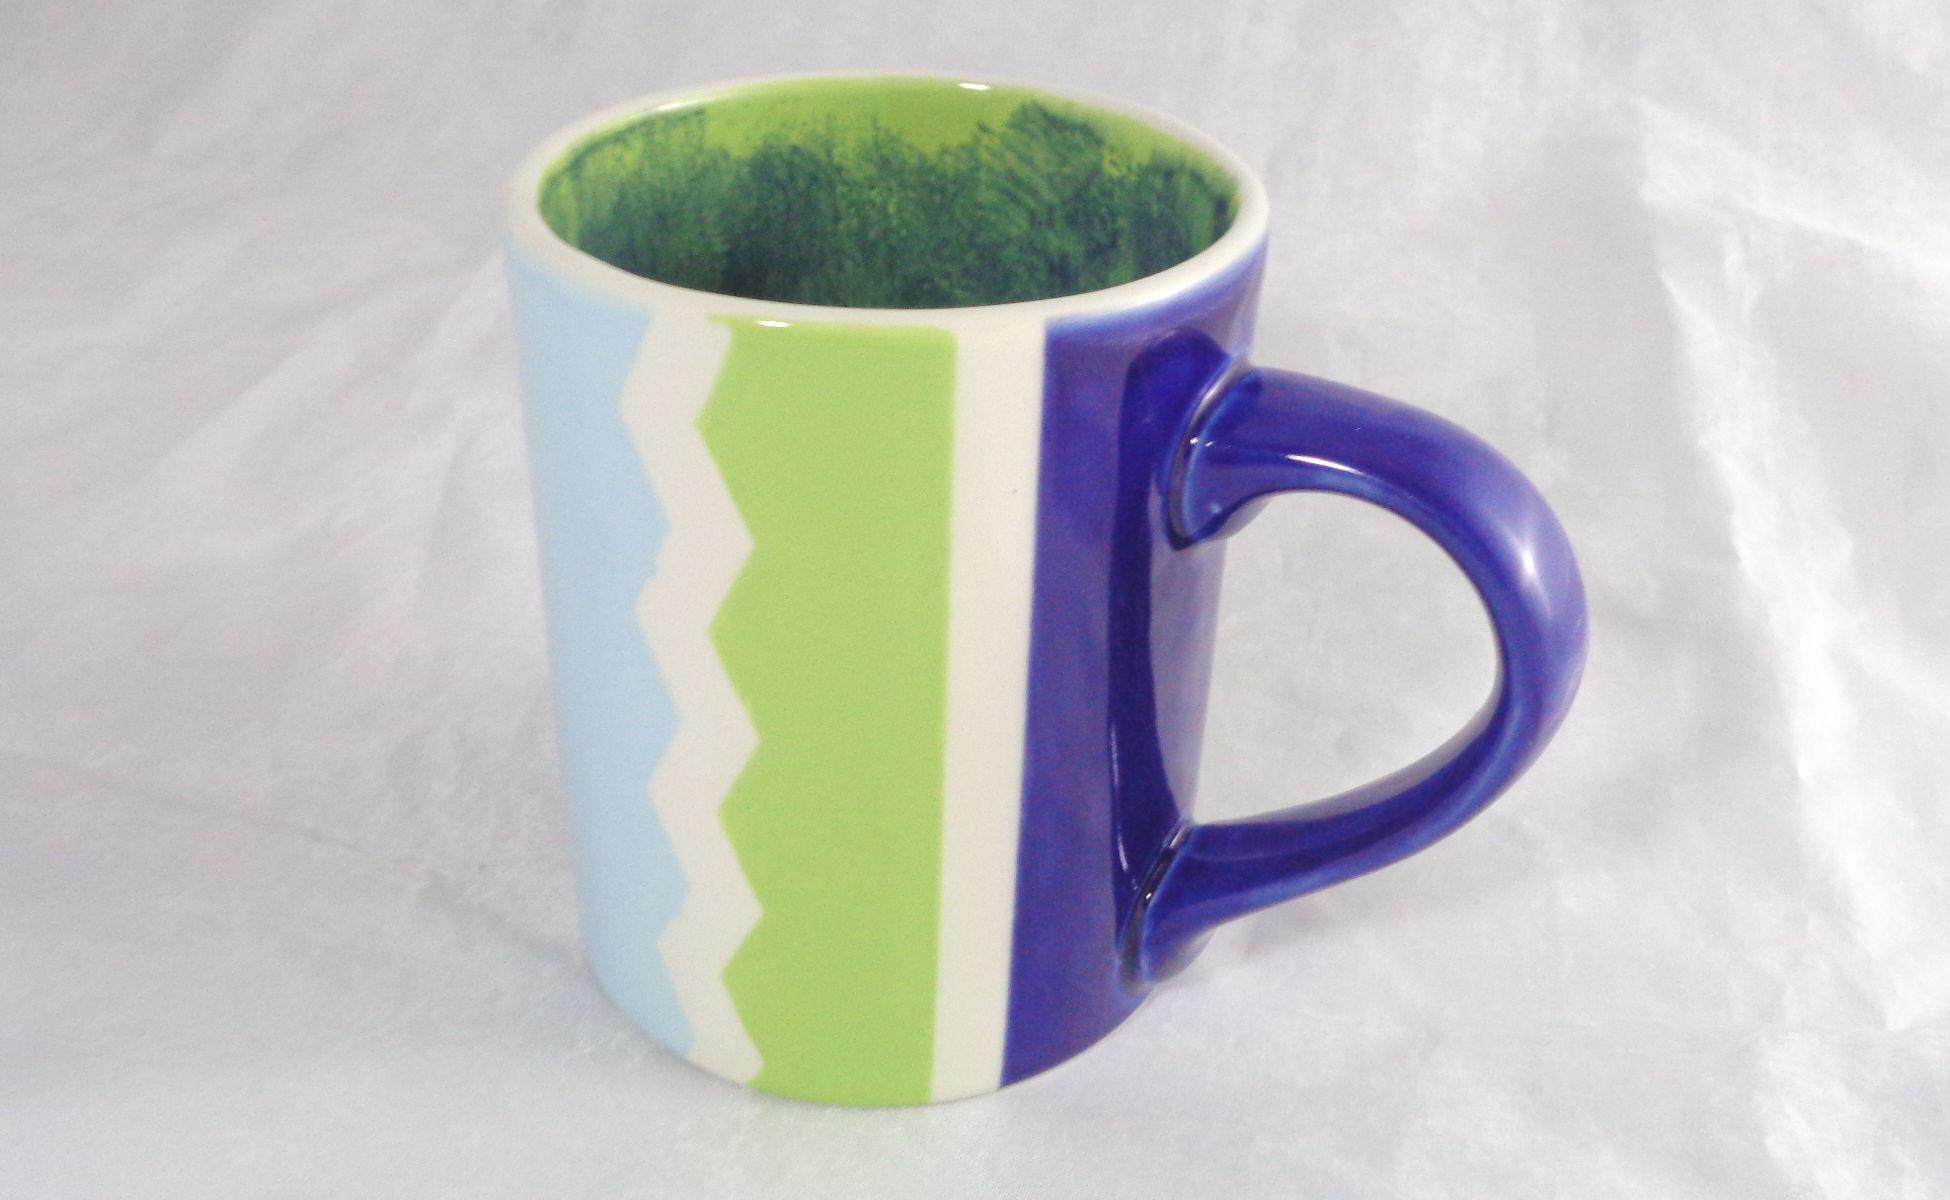 Bemalte Keramik Kaffeebecher grün-blau